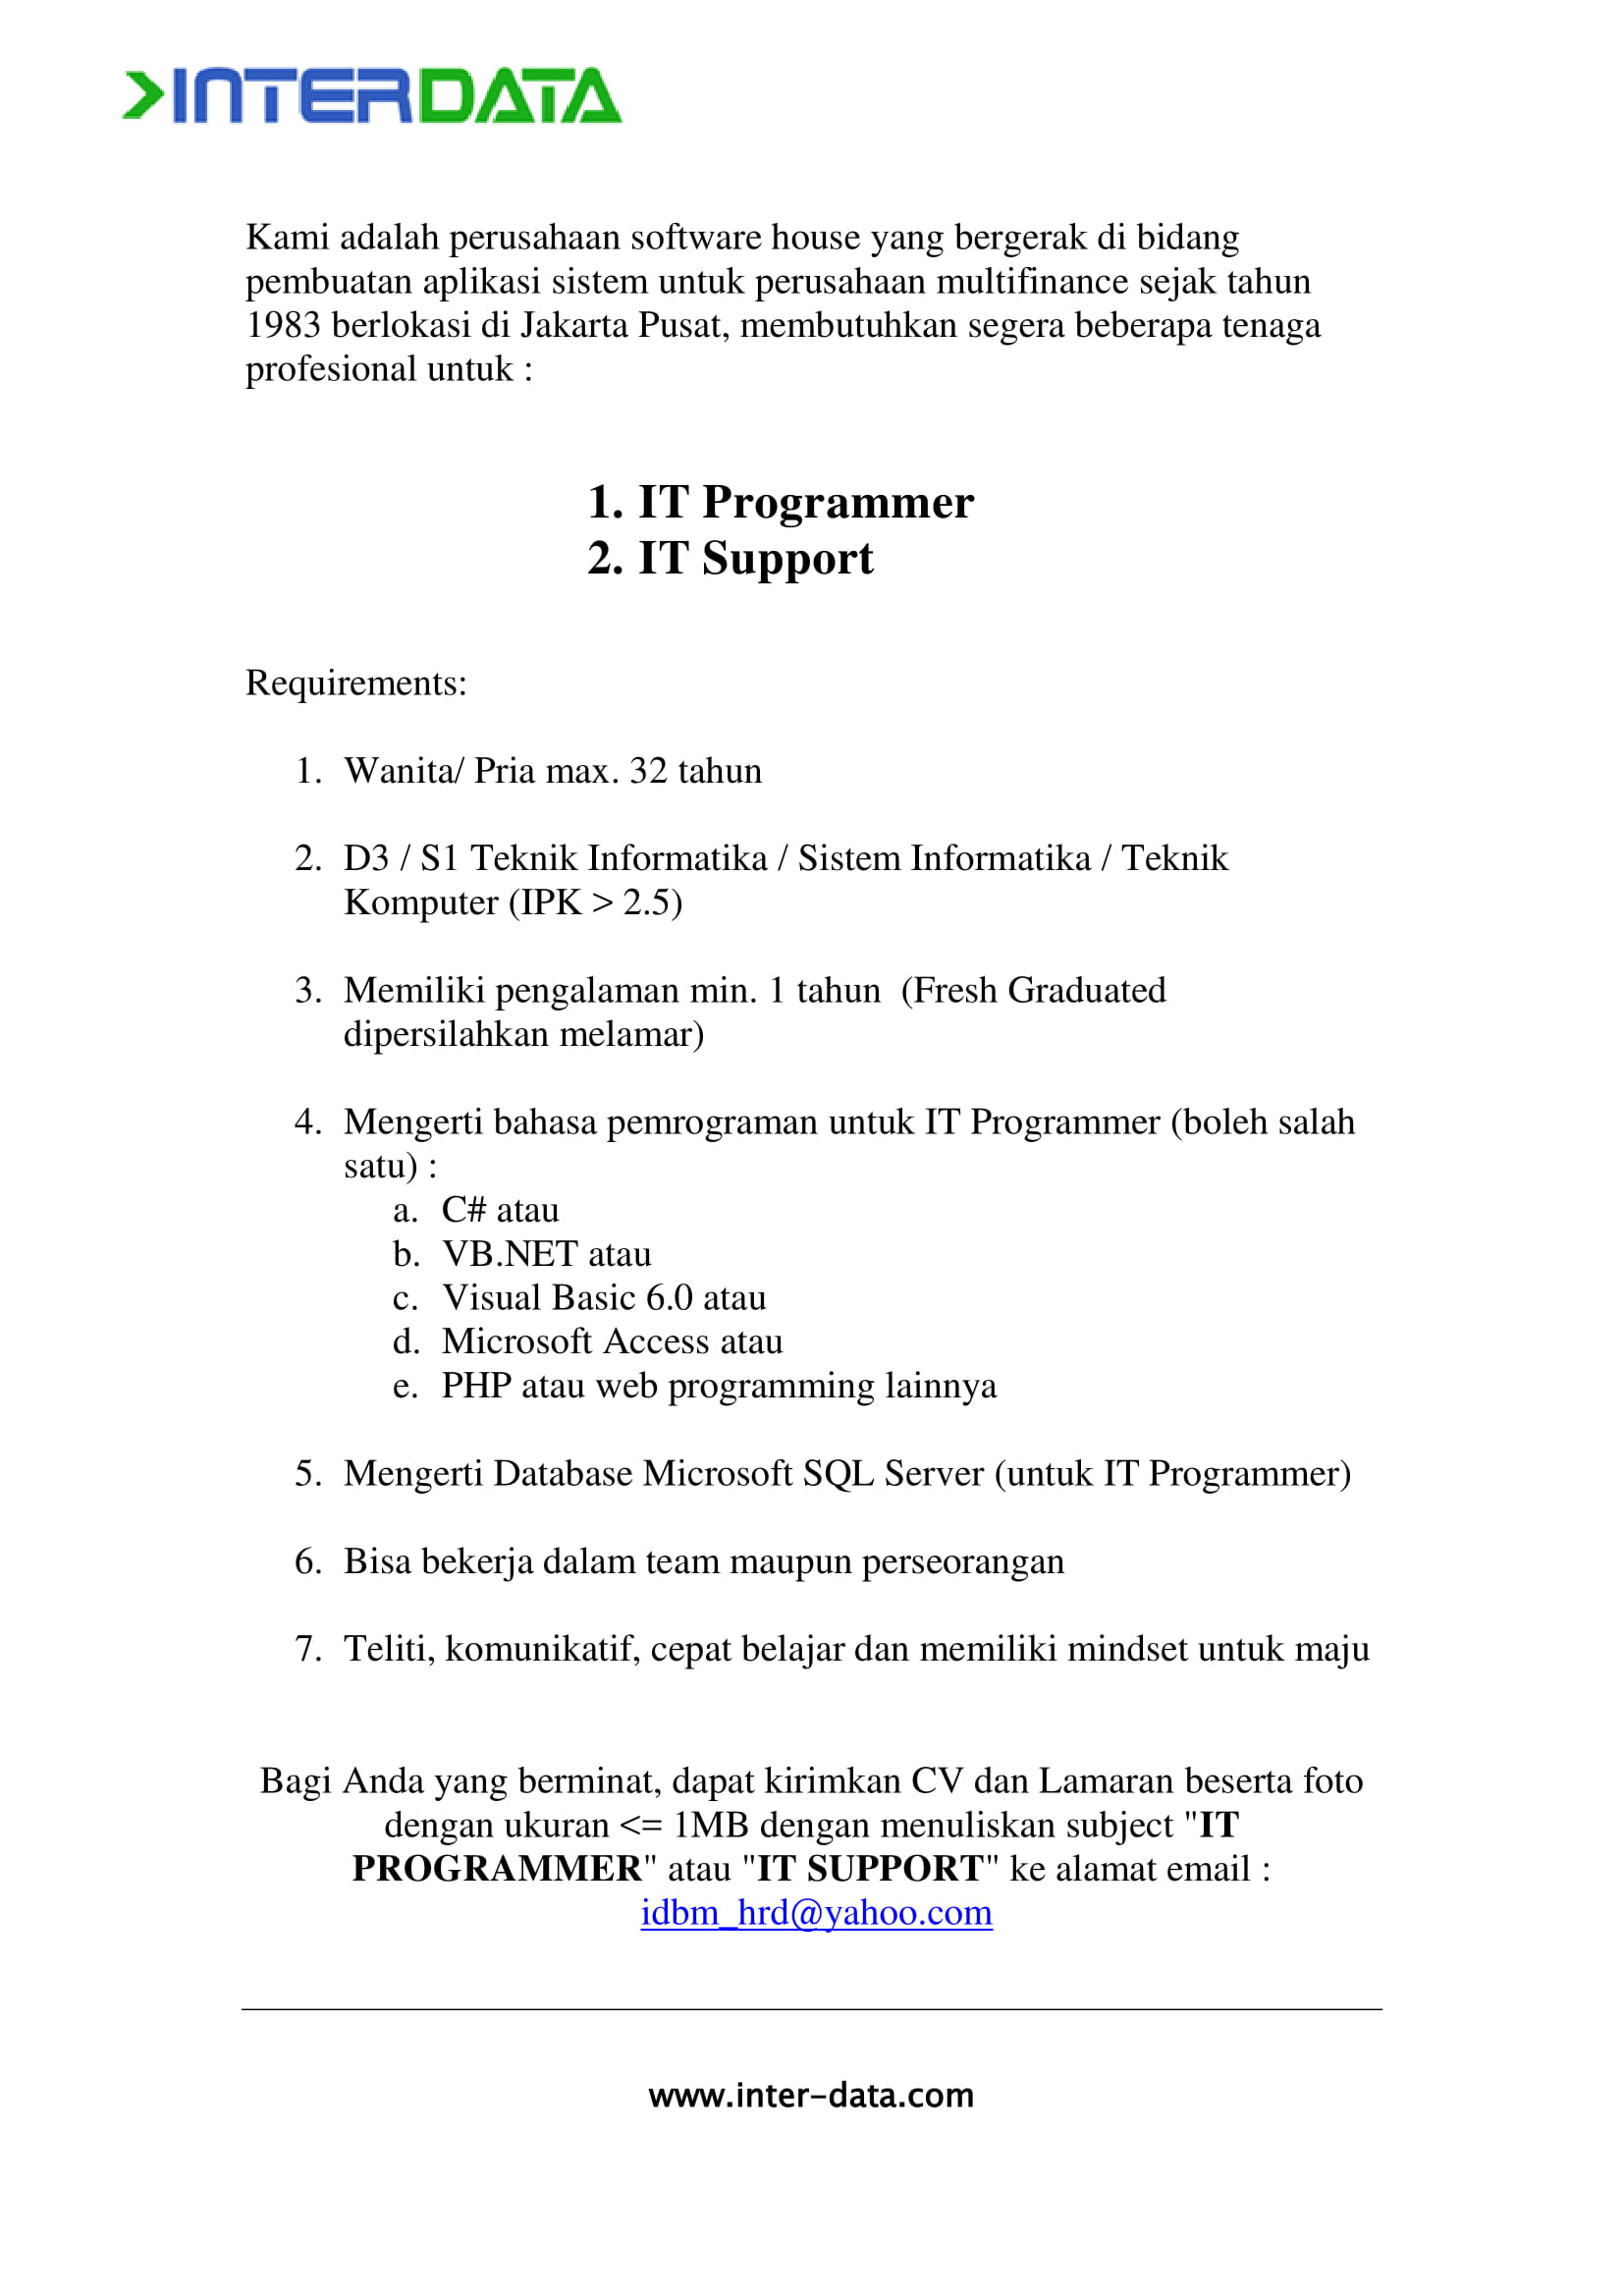 PT. Interdata Bhakti Mulya